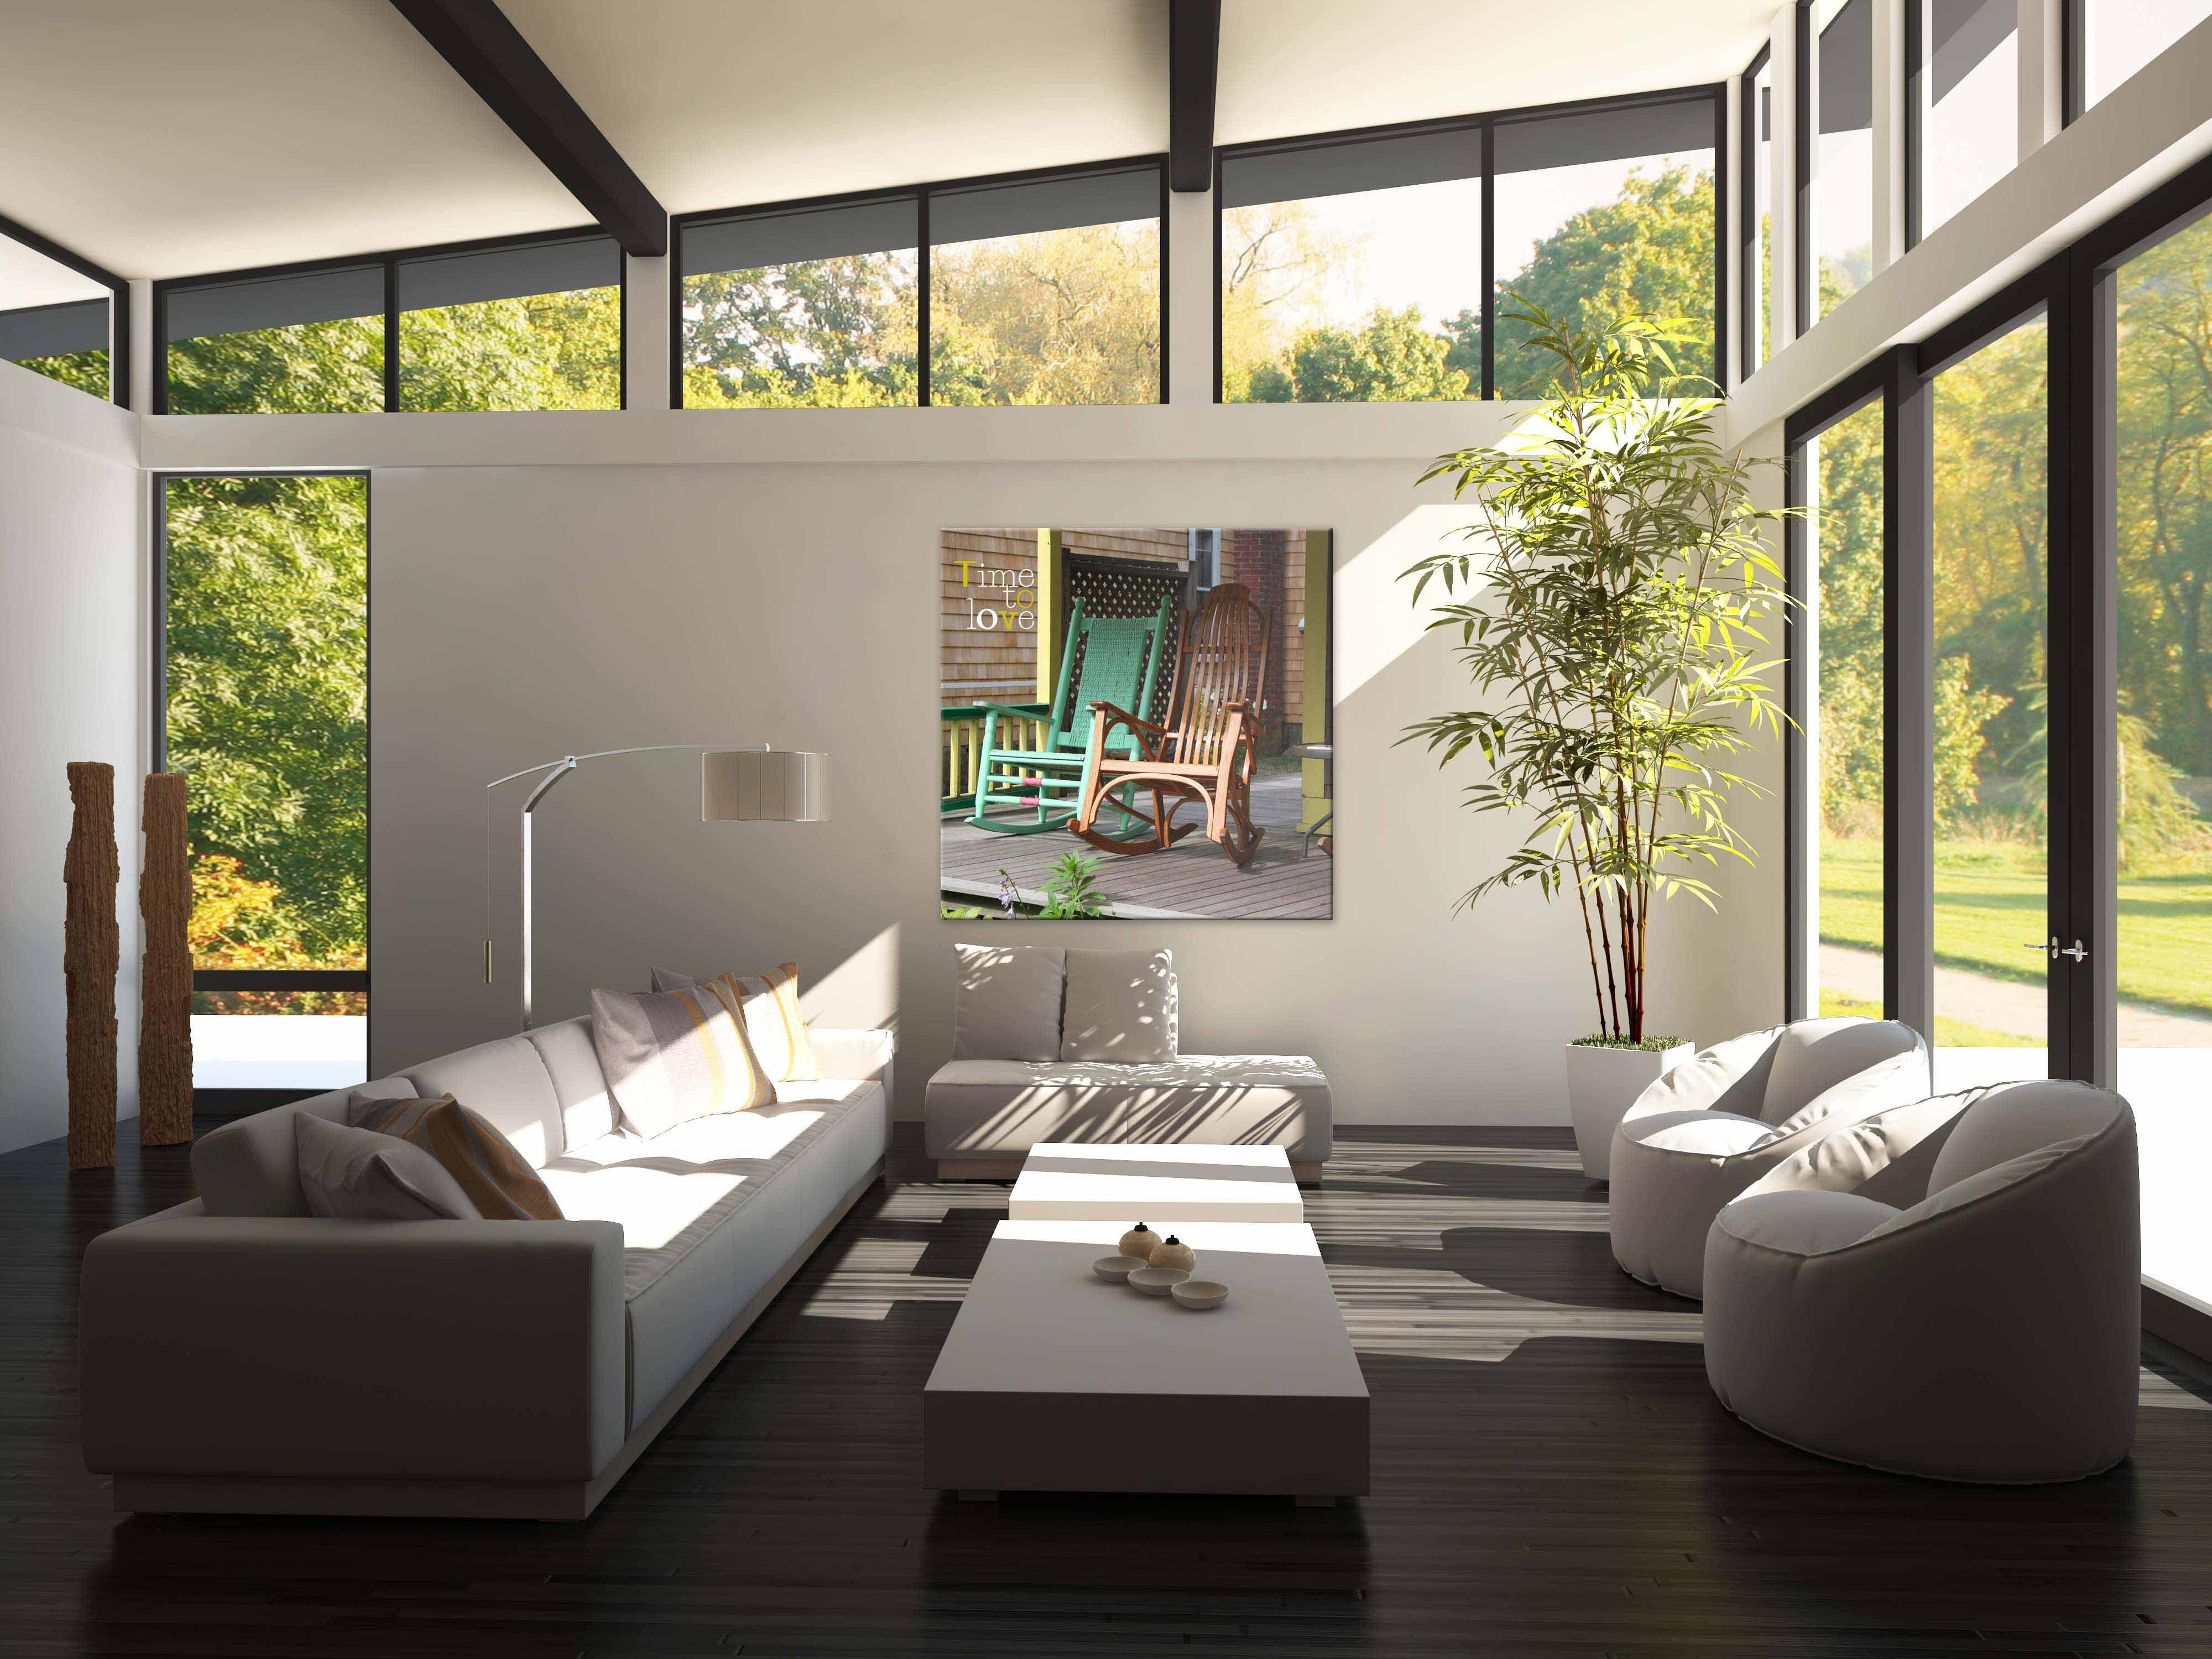 Home design for love luxuryzengarden luxury garden pinterest